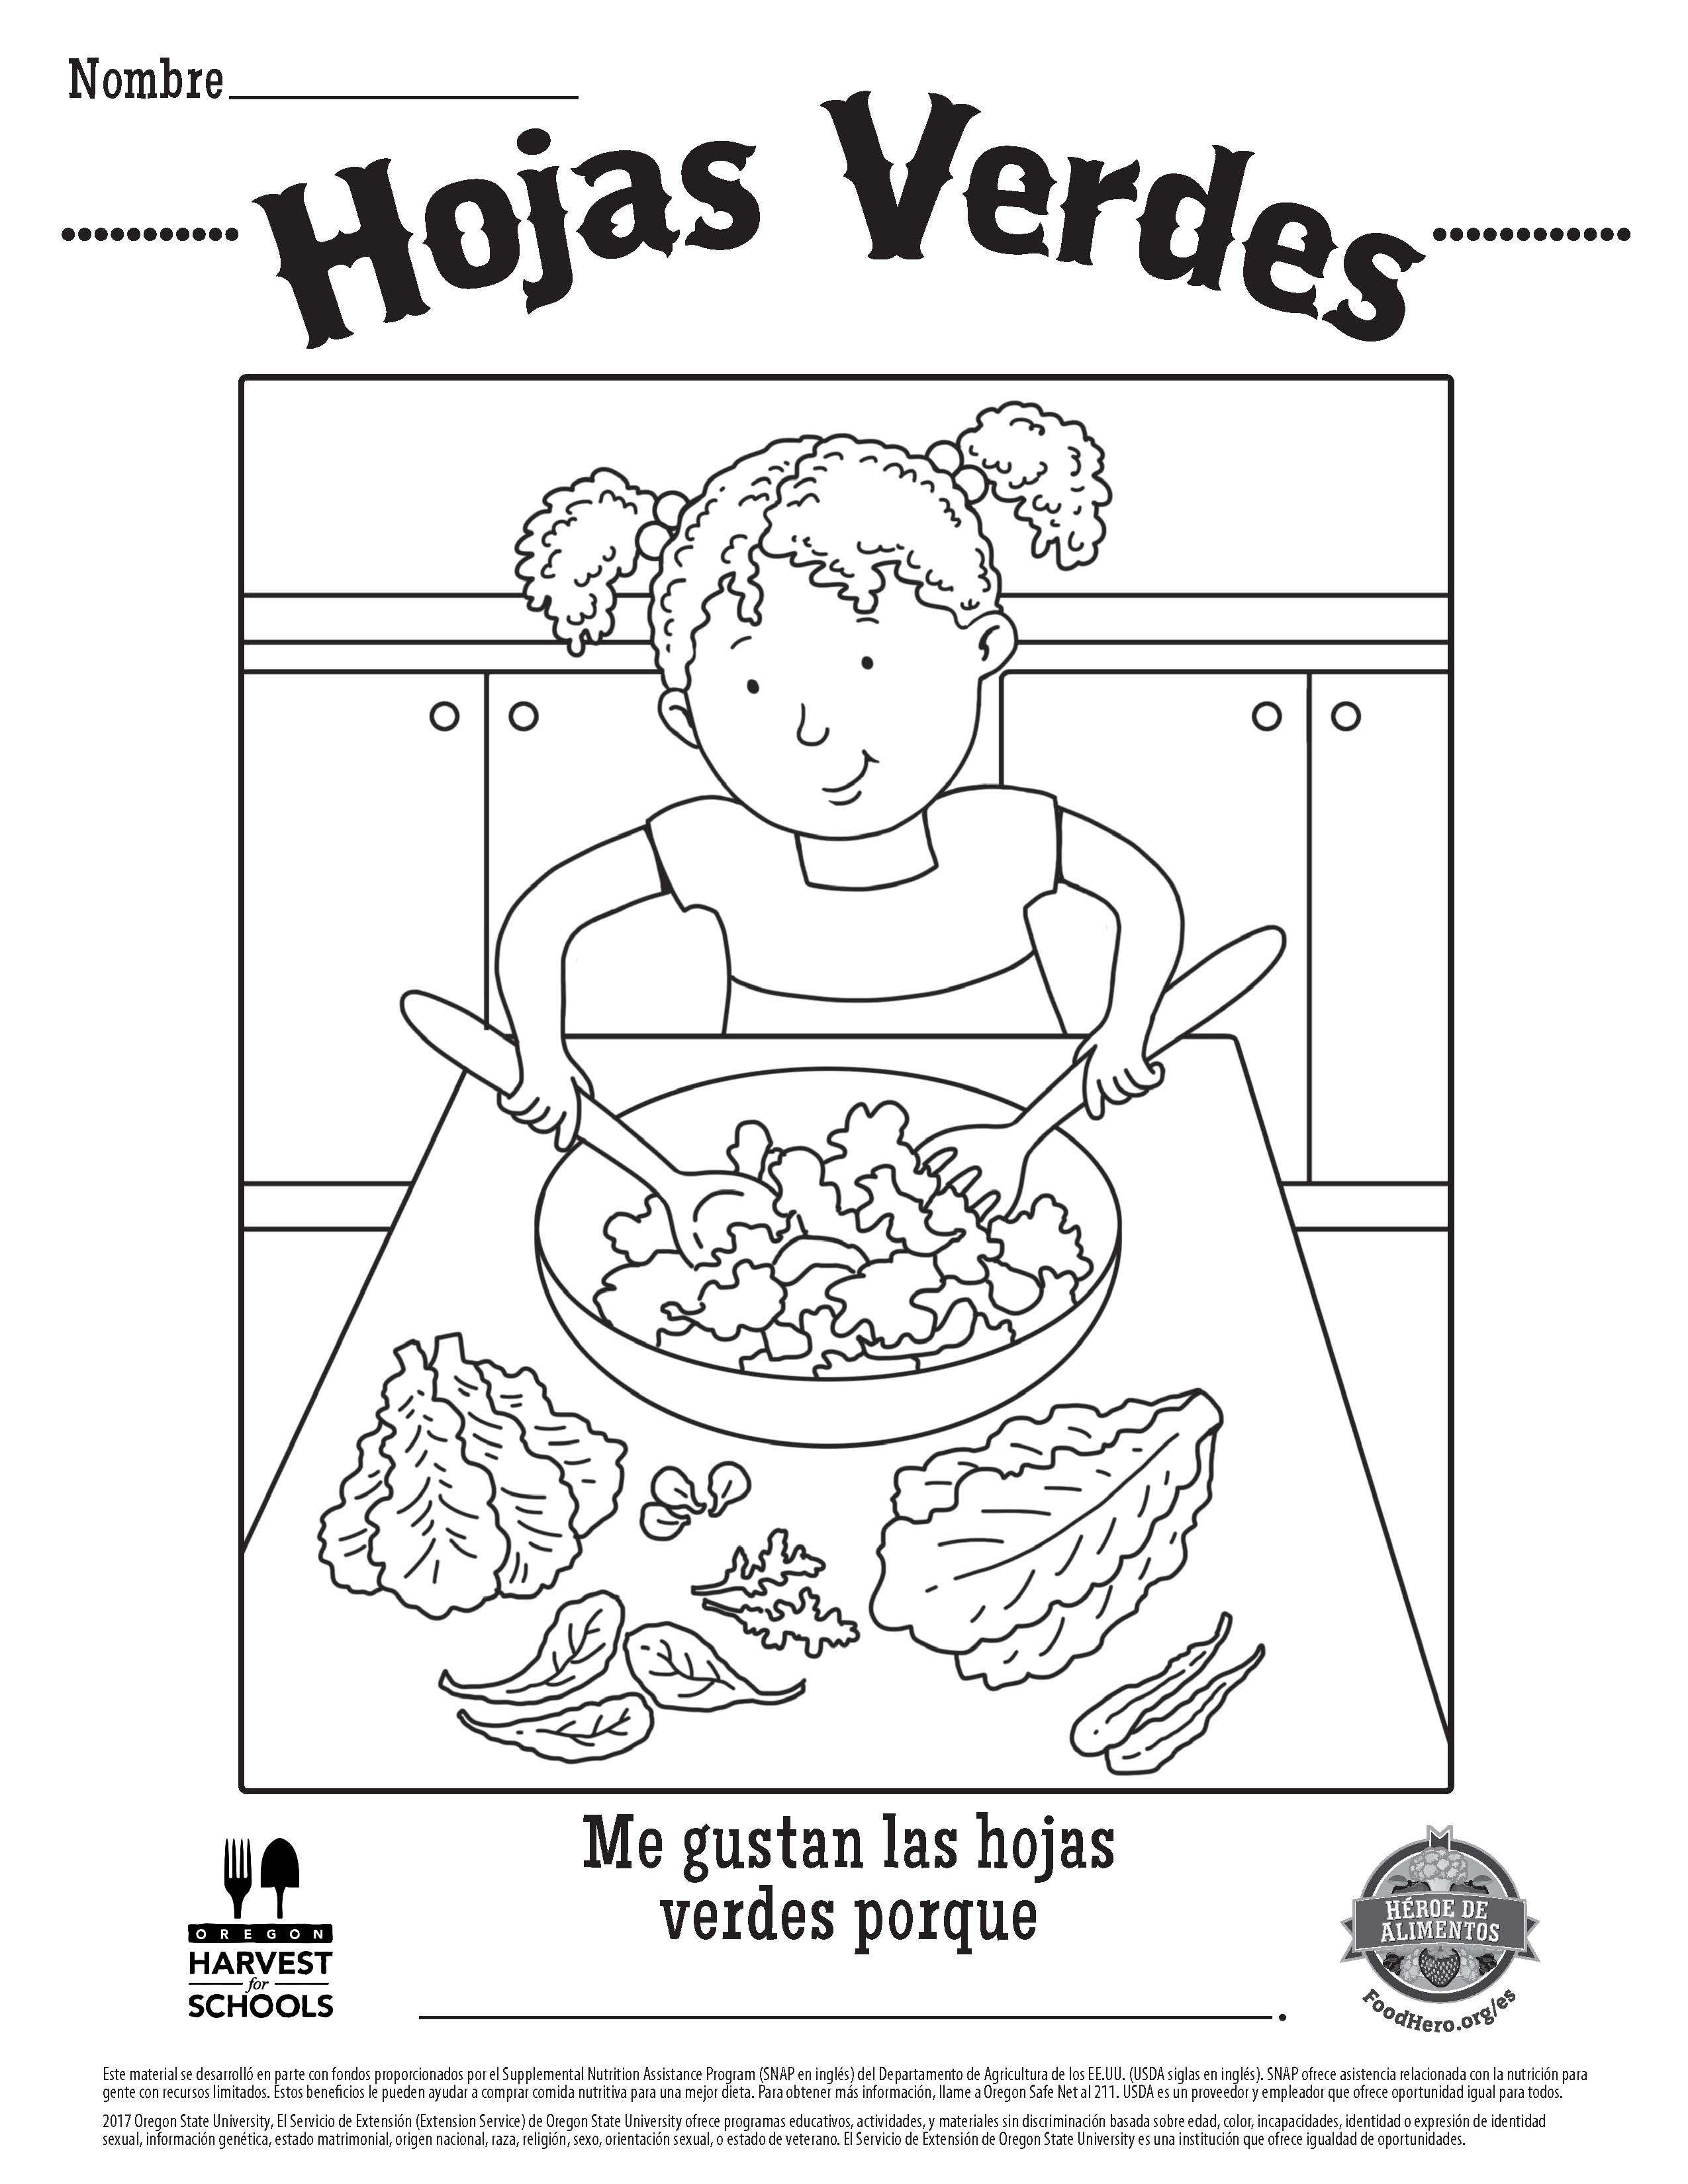 Food Hero Salad Greens in Spanish Free Printable Childrens